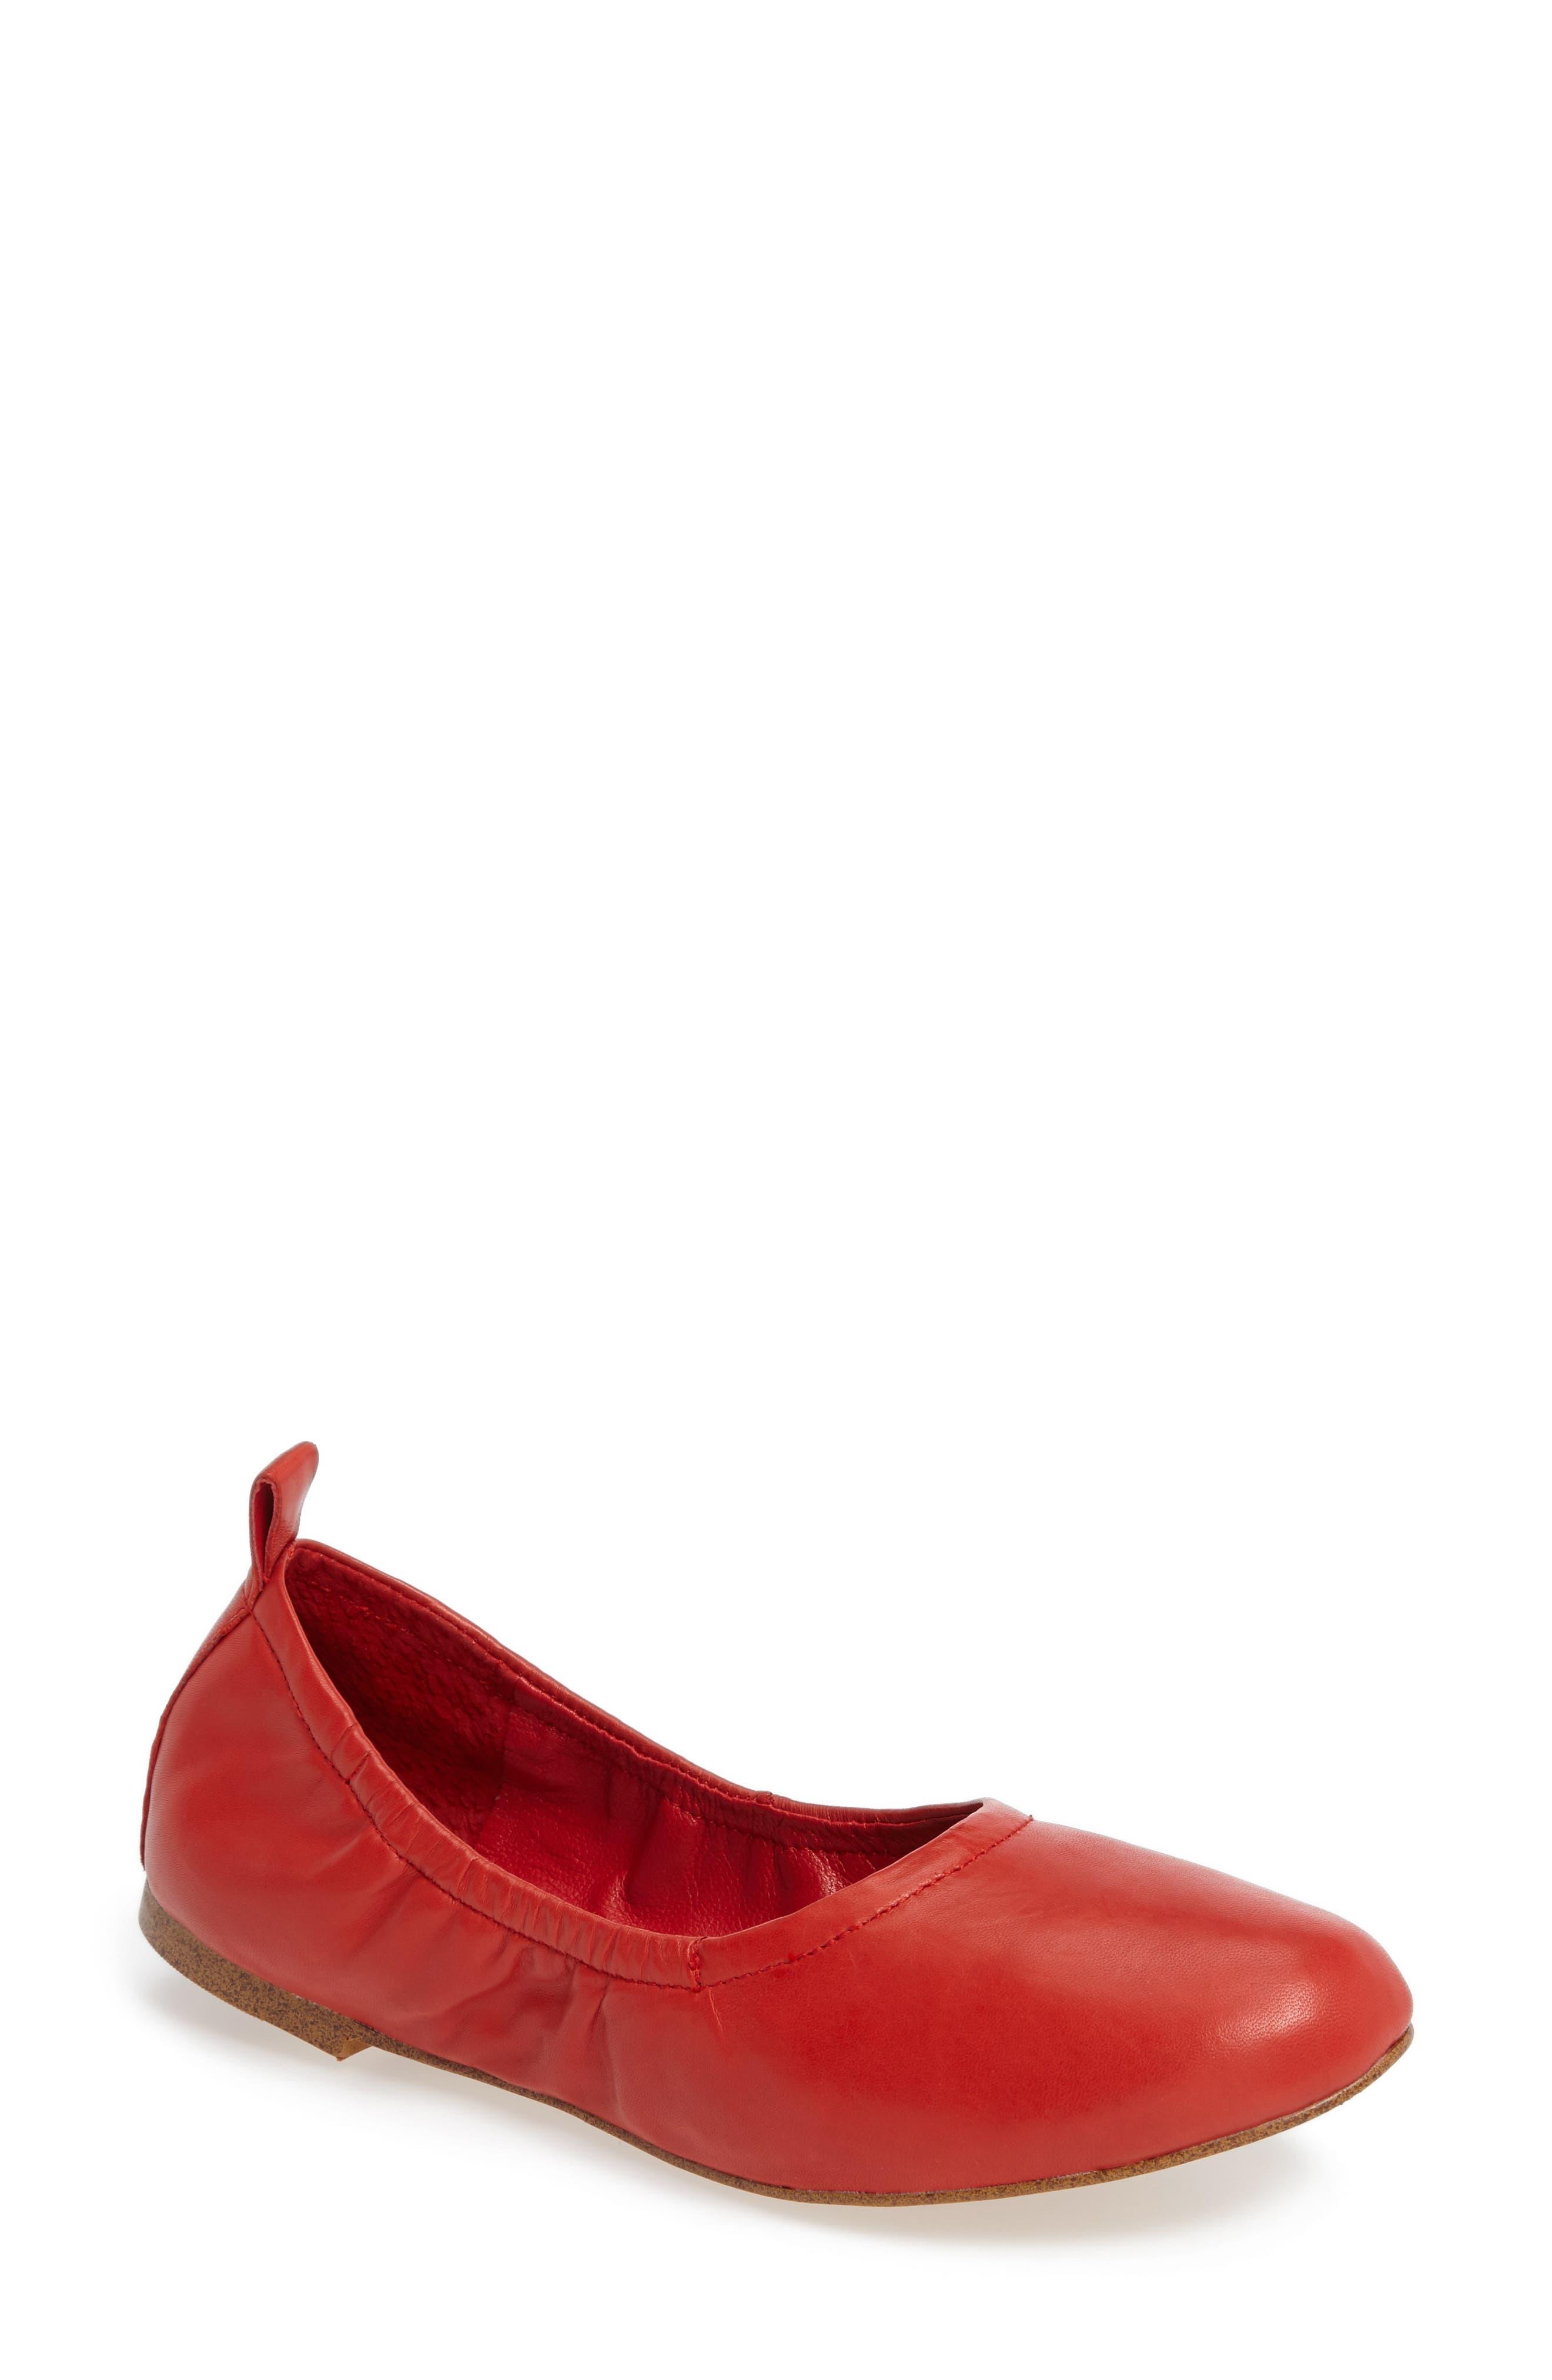 Main Image - 1.STATE Salen Ballet Flat (Women)